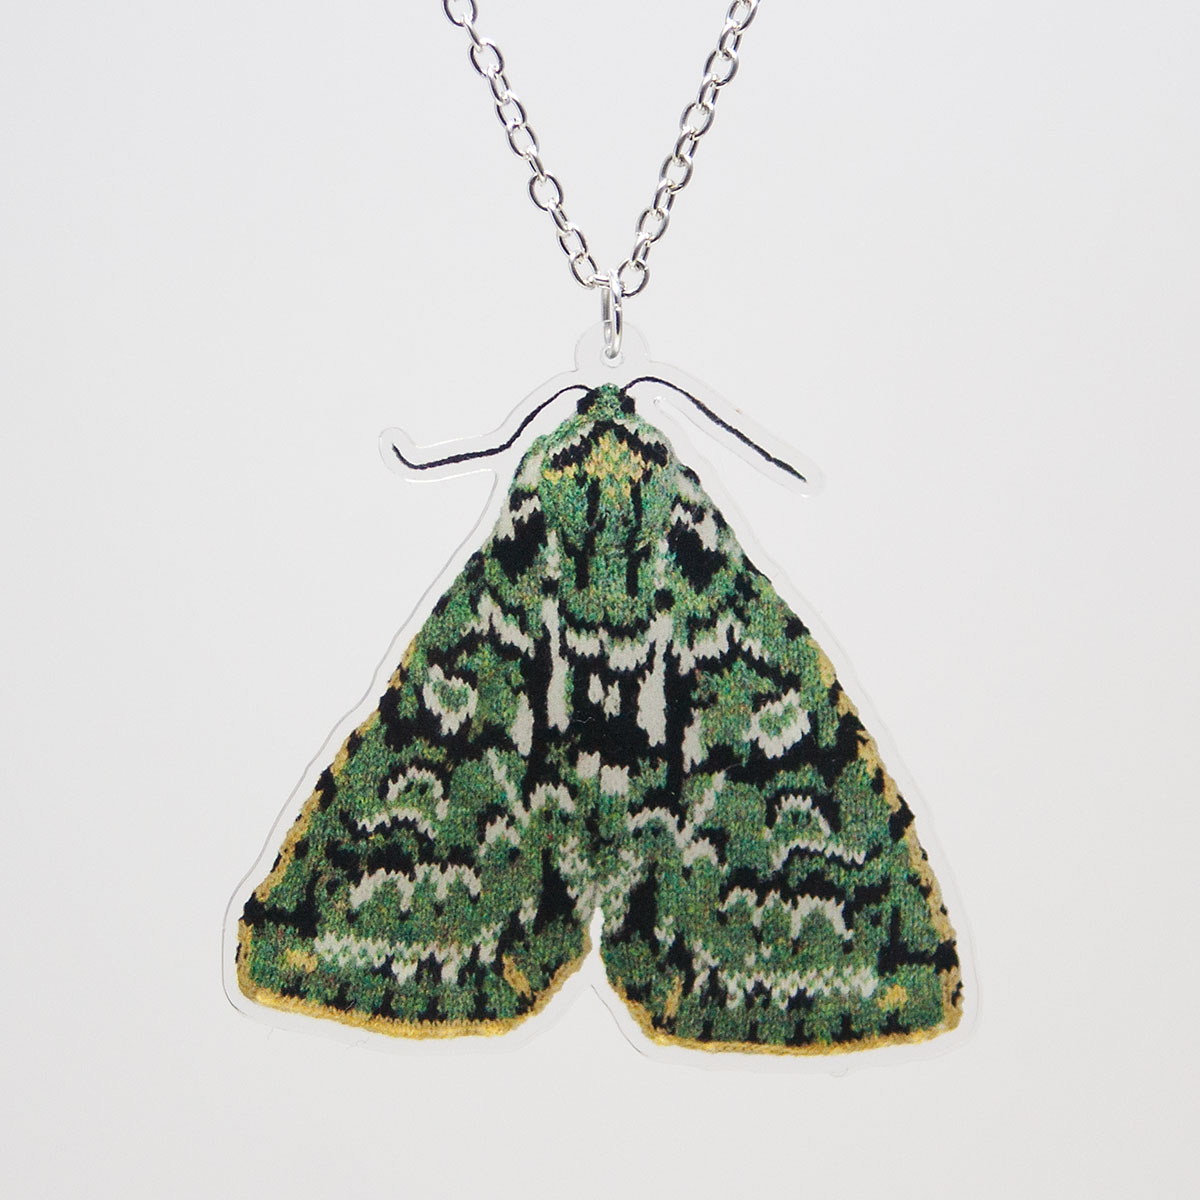 merveille du jour moth acrylic necklace. Black Bedroom Furniture Sets. Home Design Ideas